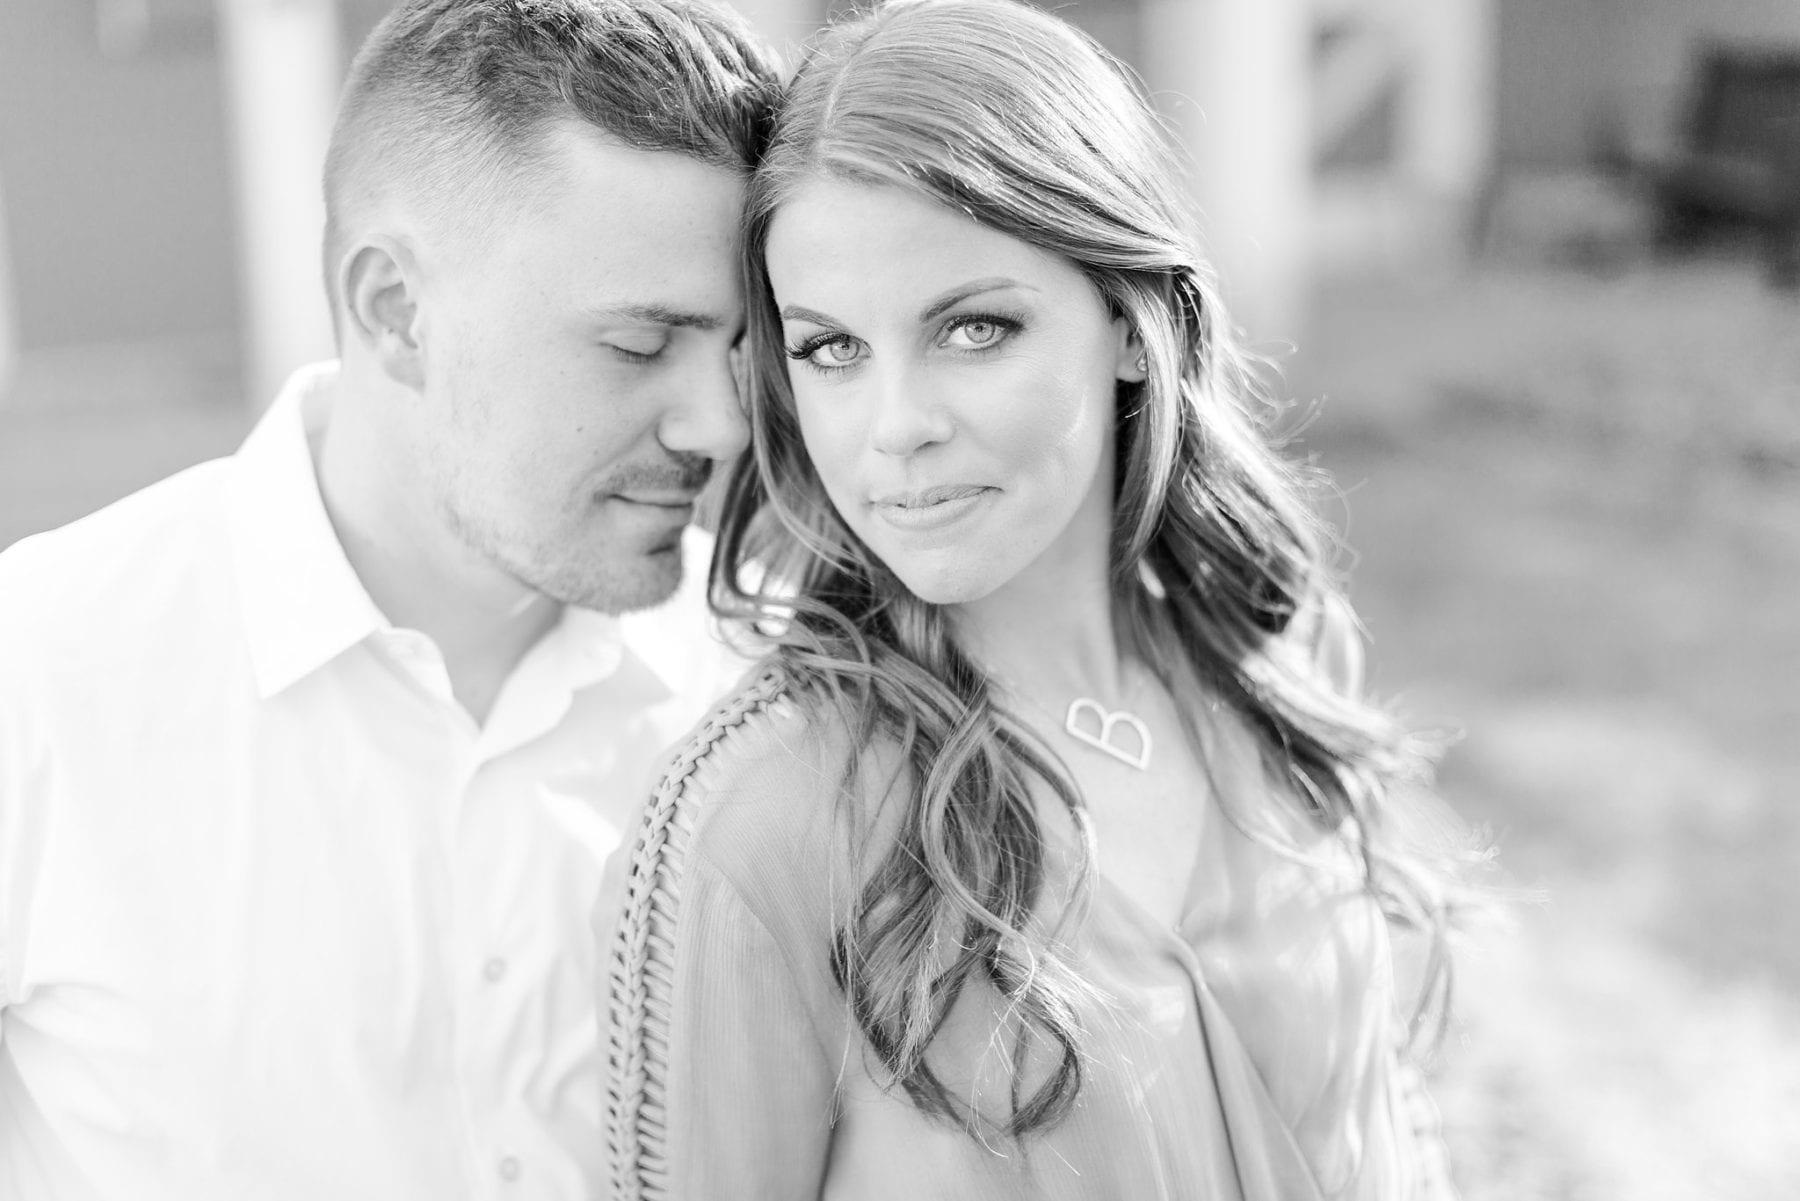 Goodstone Inn Engagement Session Virginia Wedding Photographer Megan Kelsey Photography-79.jpg